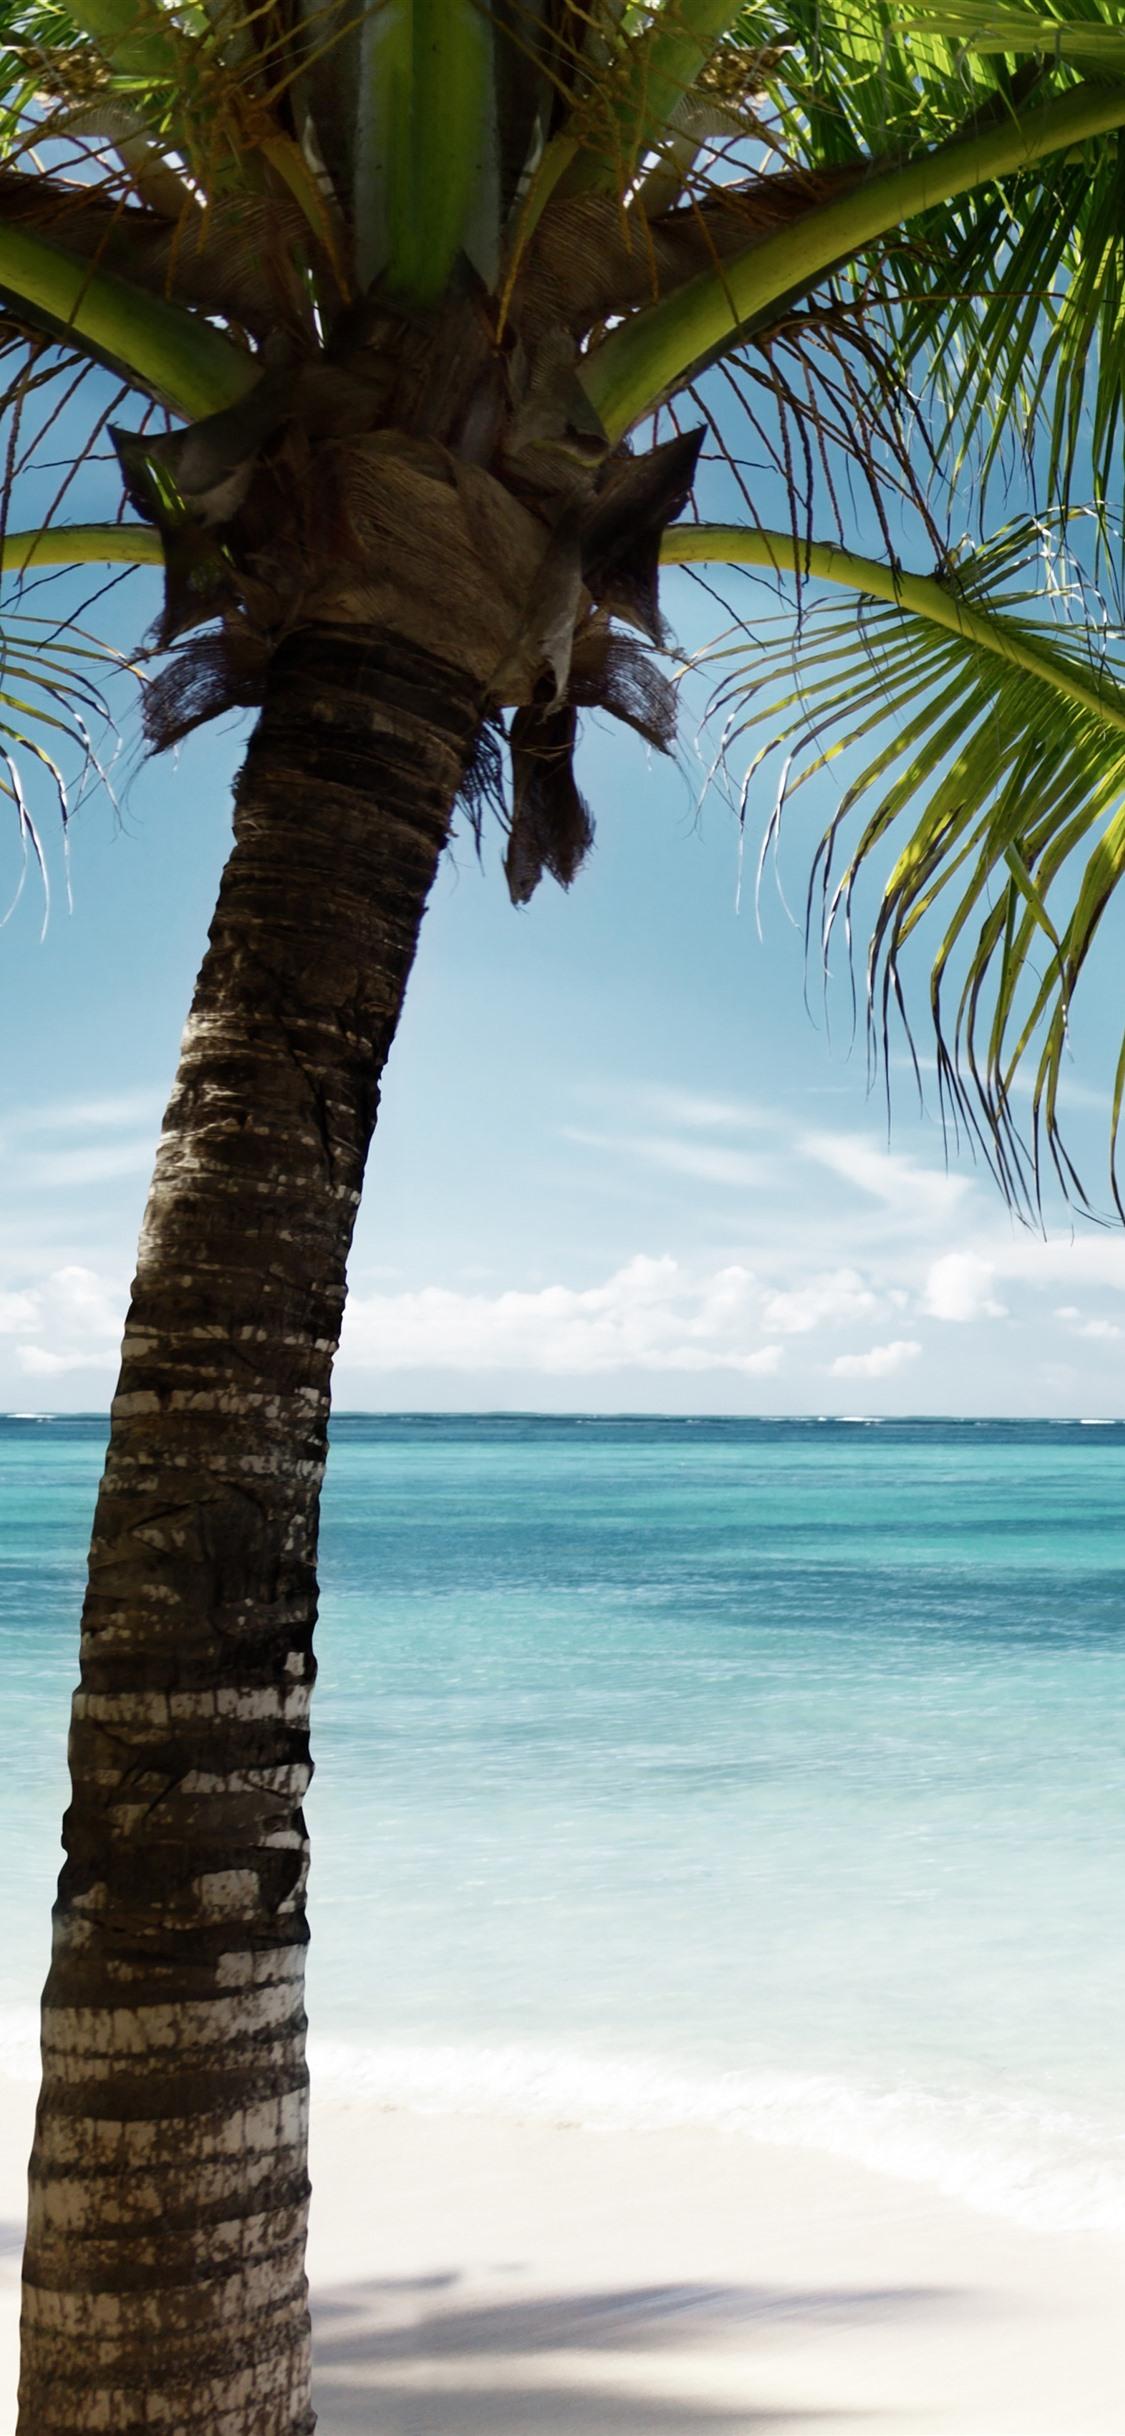 Palm Tree Green Leaves Sea Blue Tropic 1125x2436 Iphone